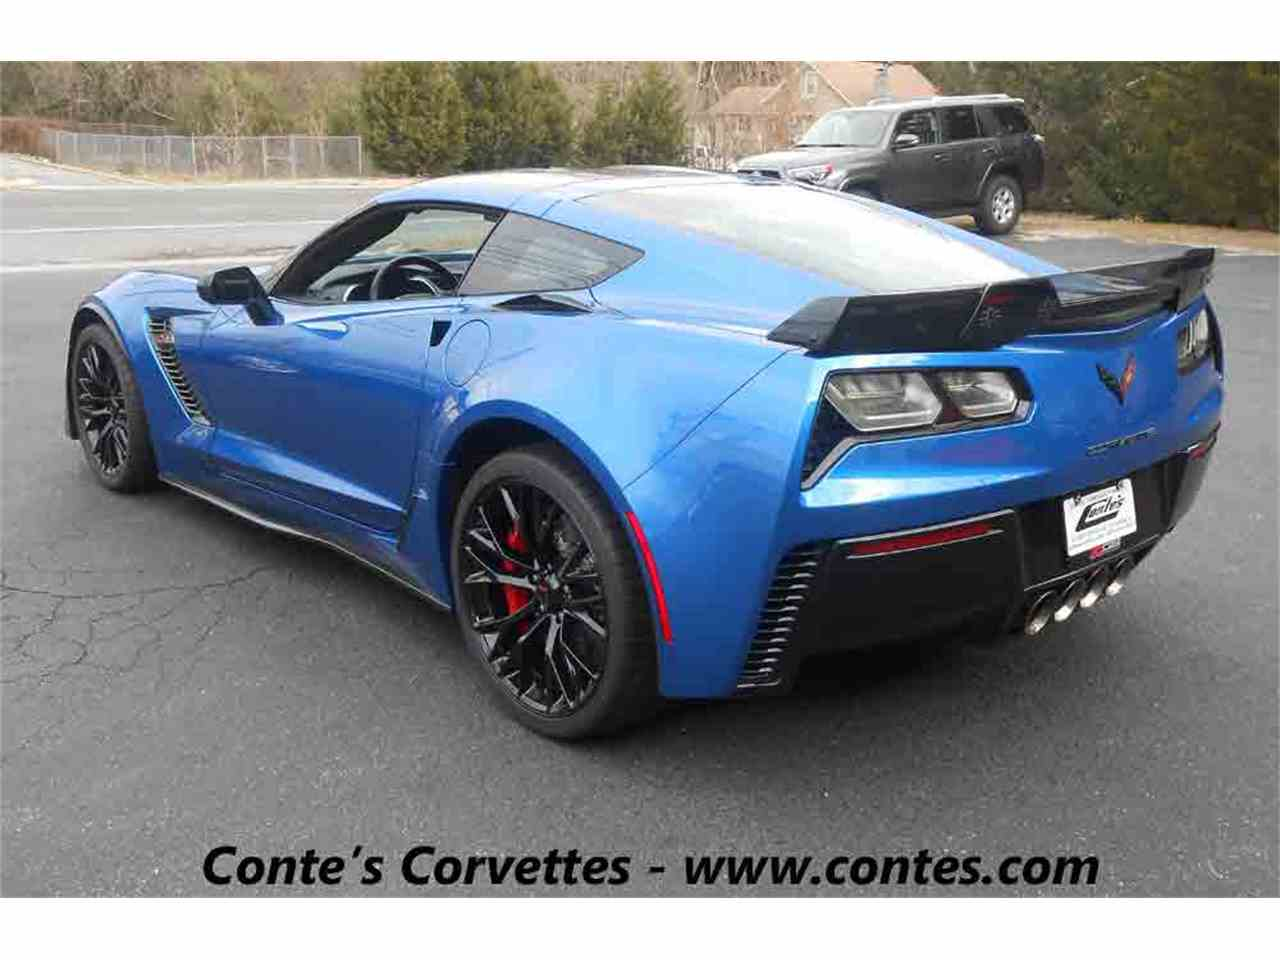 2016 chevrolet corvette z06 z07 for sale cc 947303. Black Bedroom Furniture Sets. Home Design Ideas